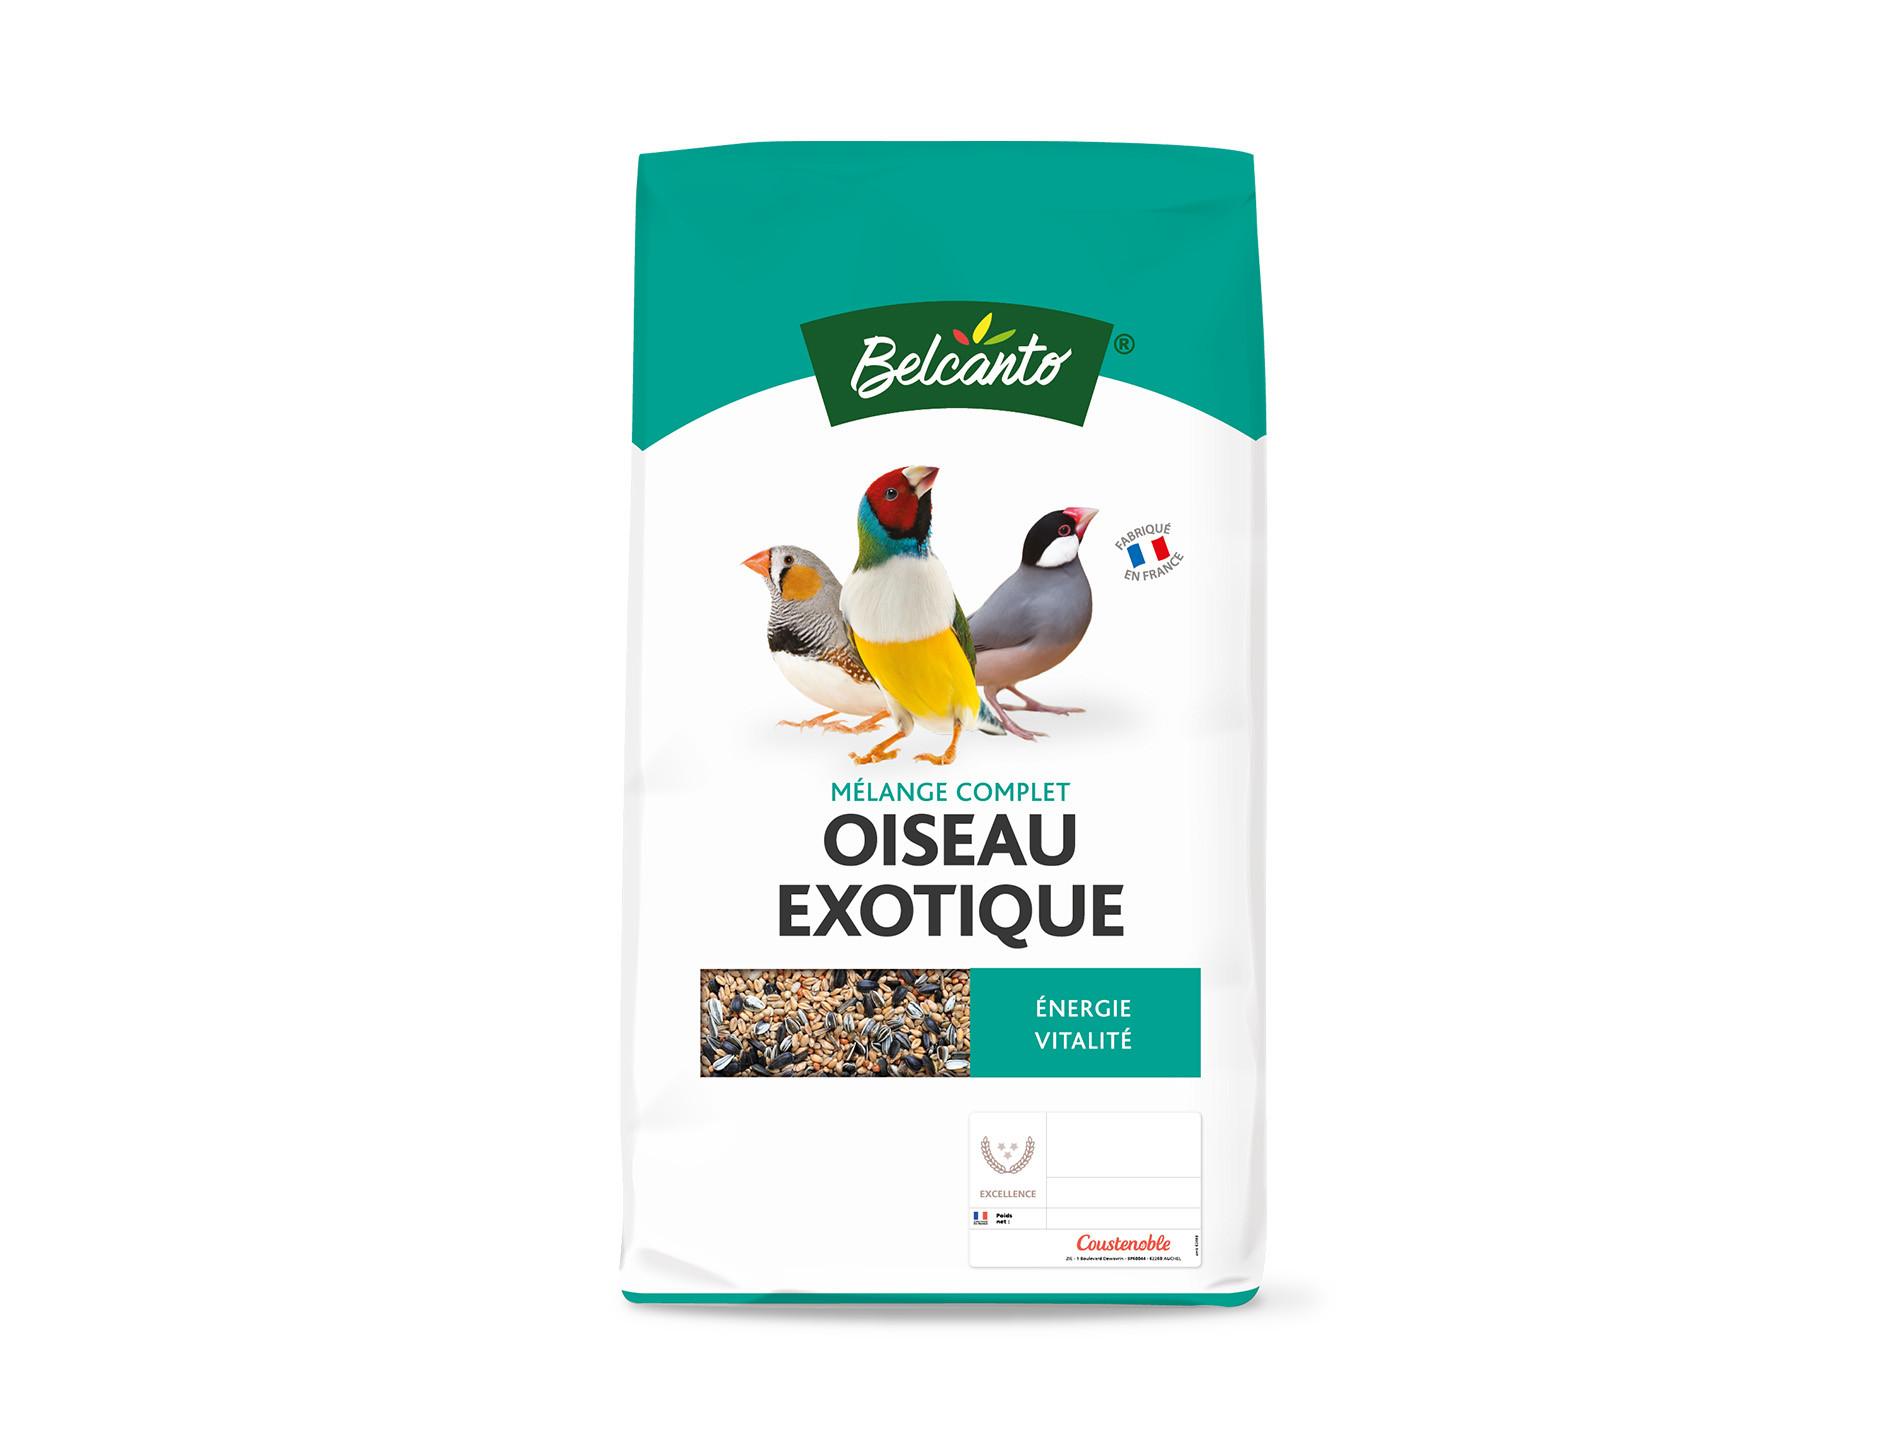 melange-graines-exotiques-belcanto-20kg-